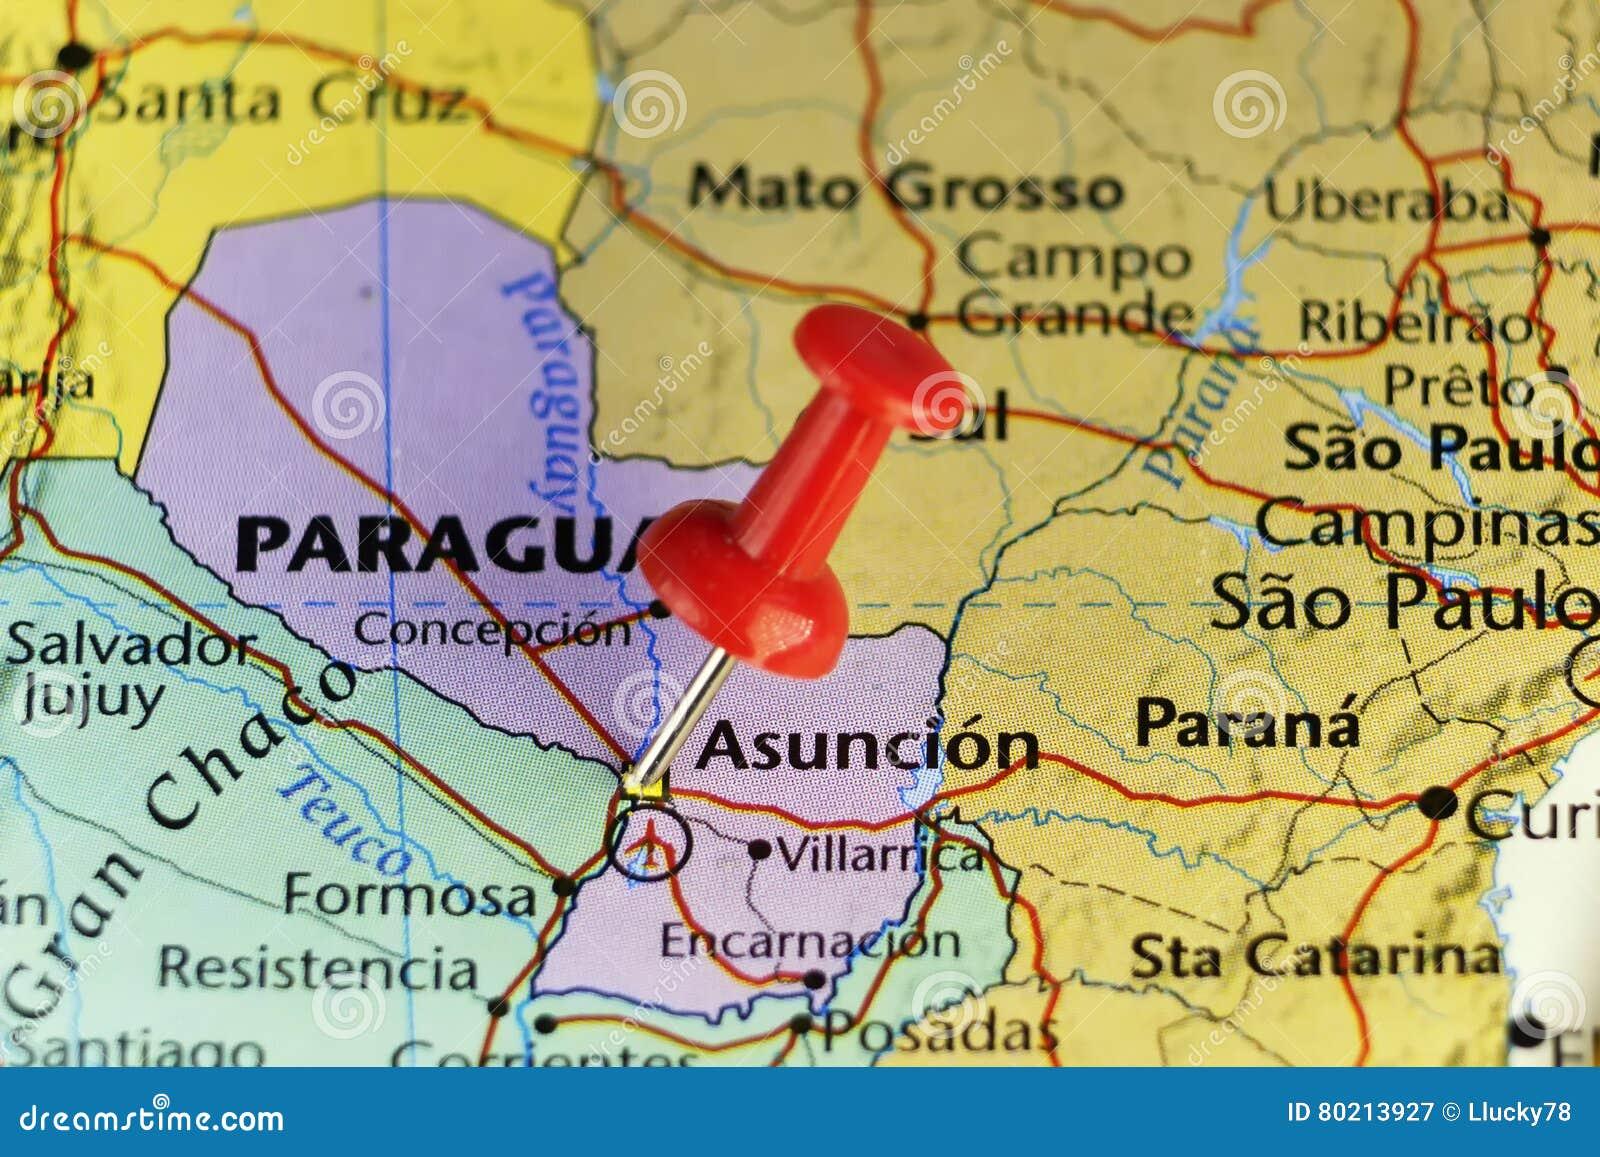 Asuncion Paraguay Map Destination Map, Asuncion Paraguay Stock Illustration